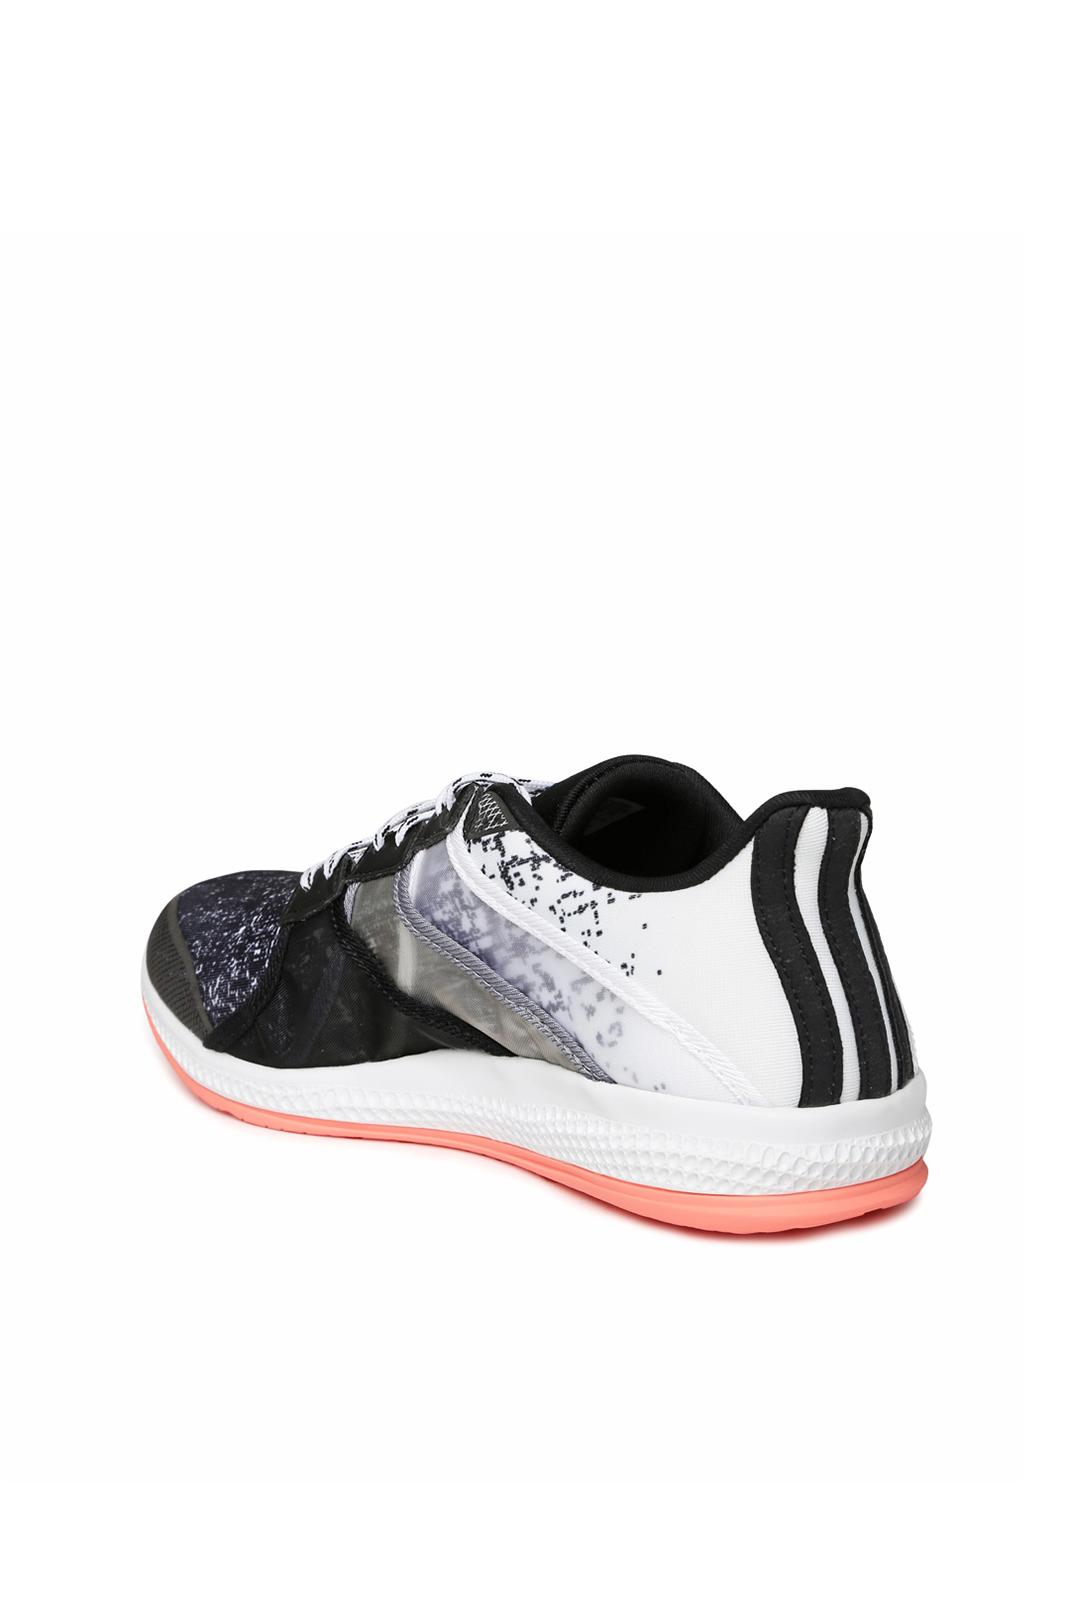 Baskets / Sneakers  Adidas BB3985 Gymbreaker Bounce GREY